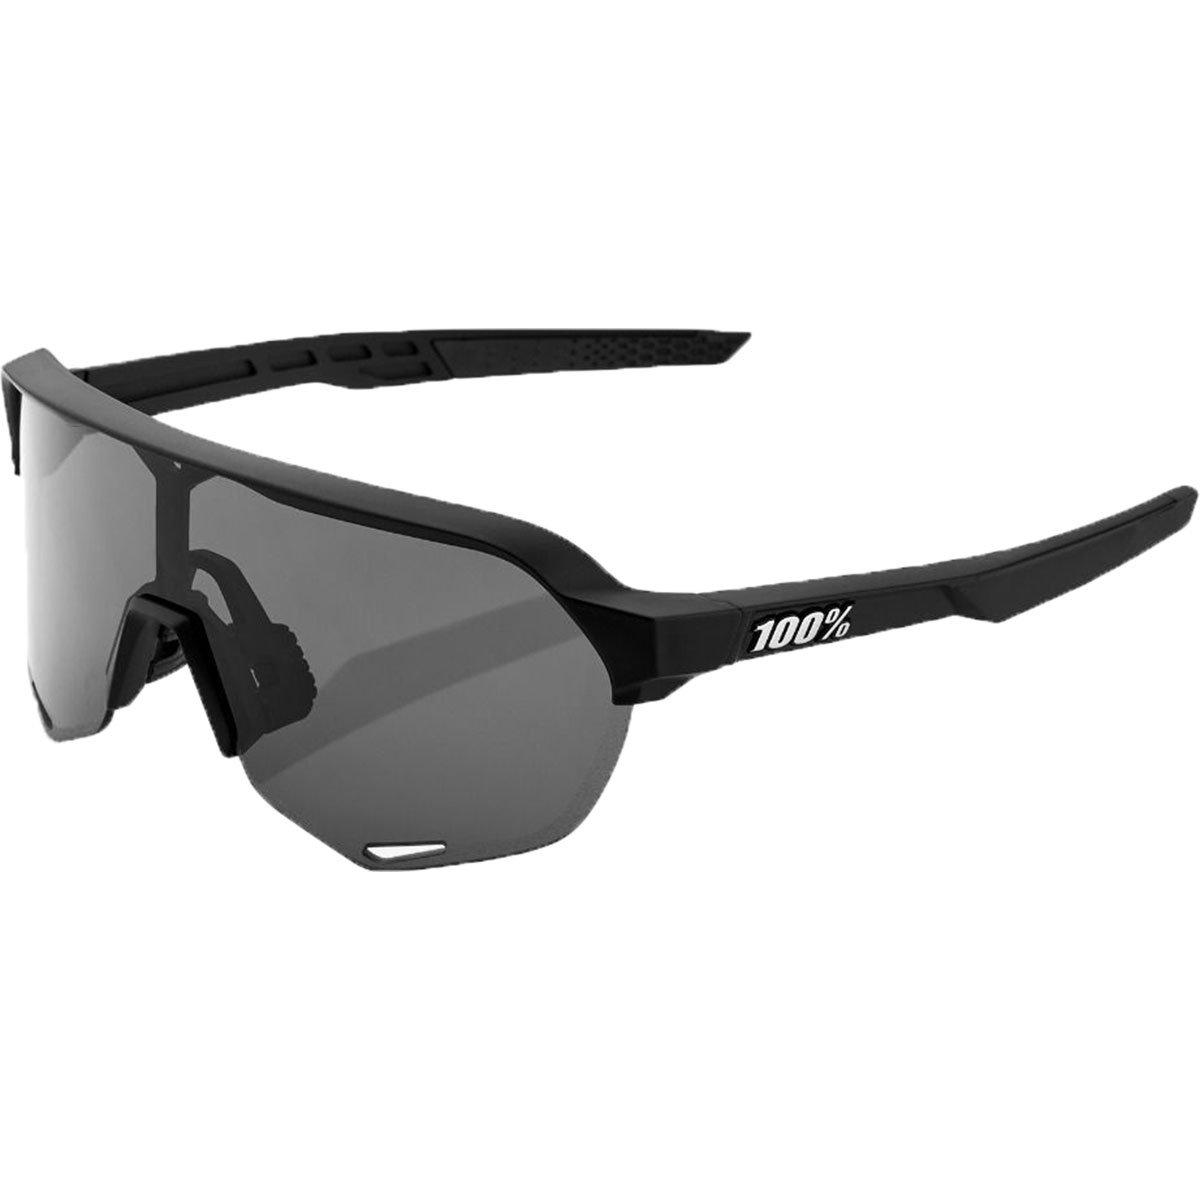 100% S2 Sunglasses,OS,Soft Tact Black/Smoke by 100%